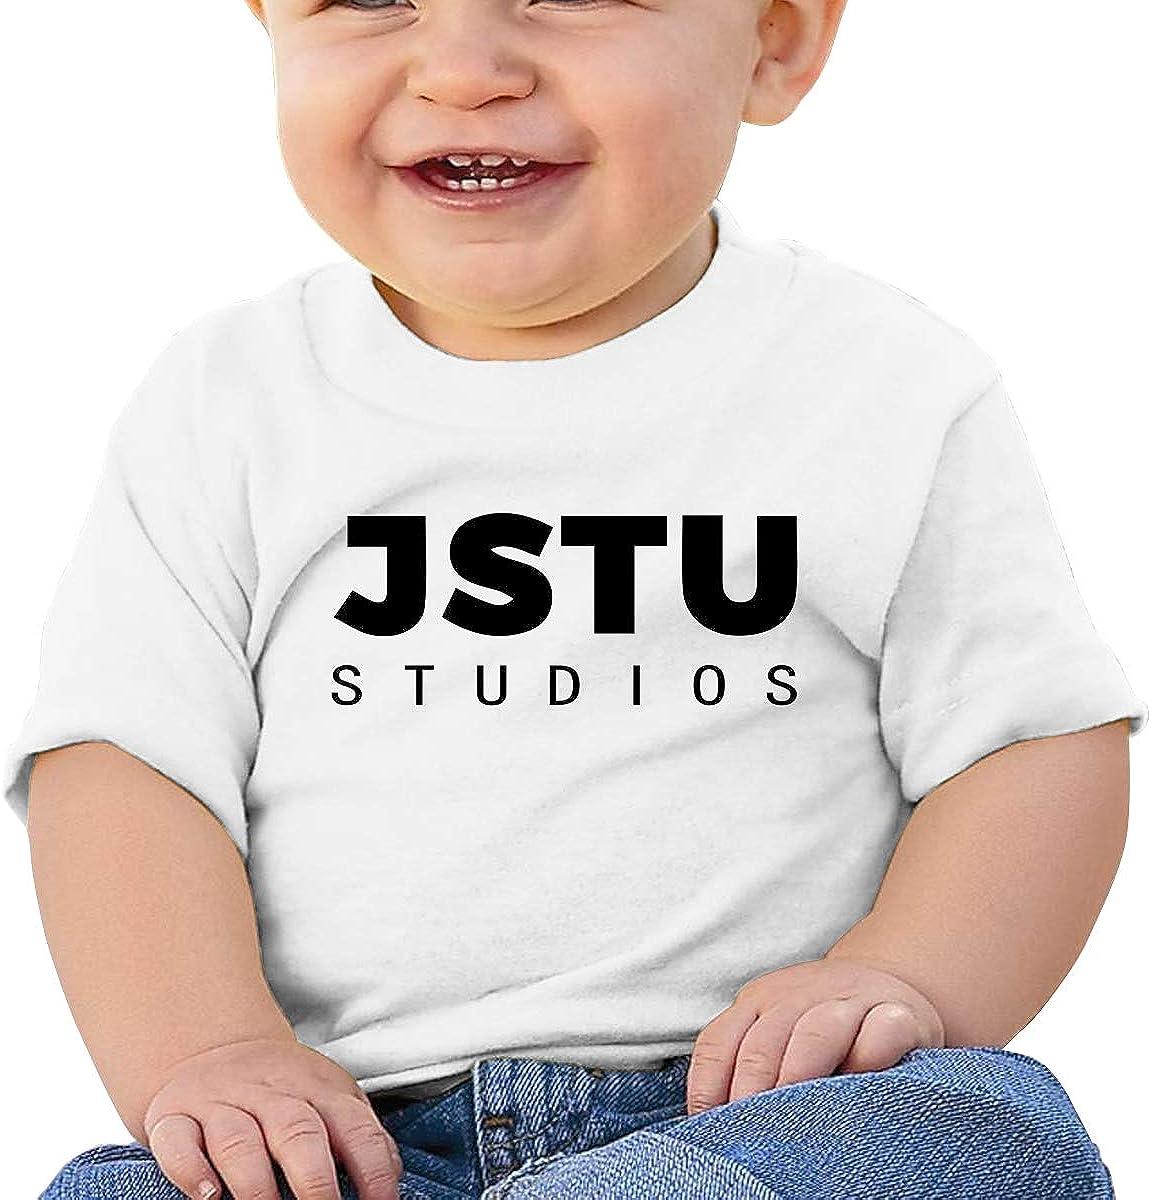 NOT Baby JStuStudios Shirts Toddler Cotton Tee